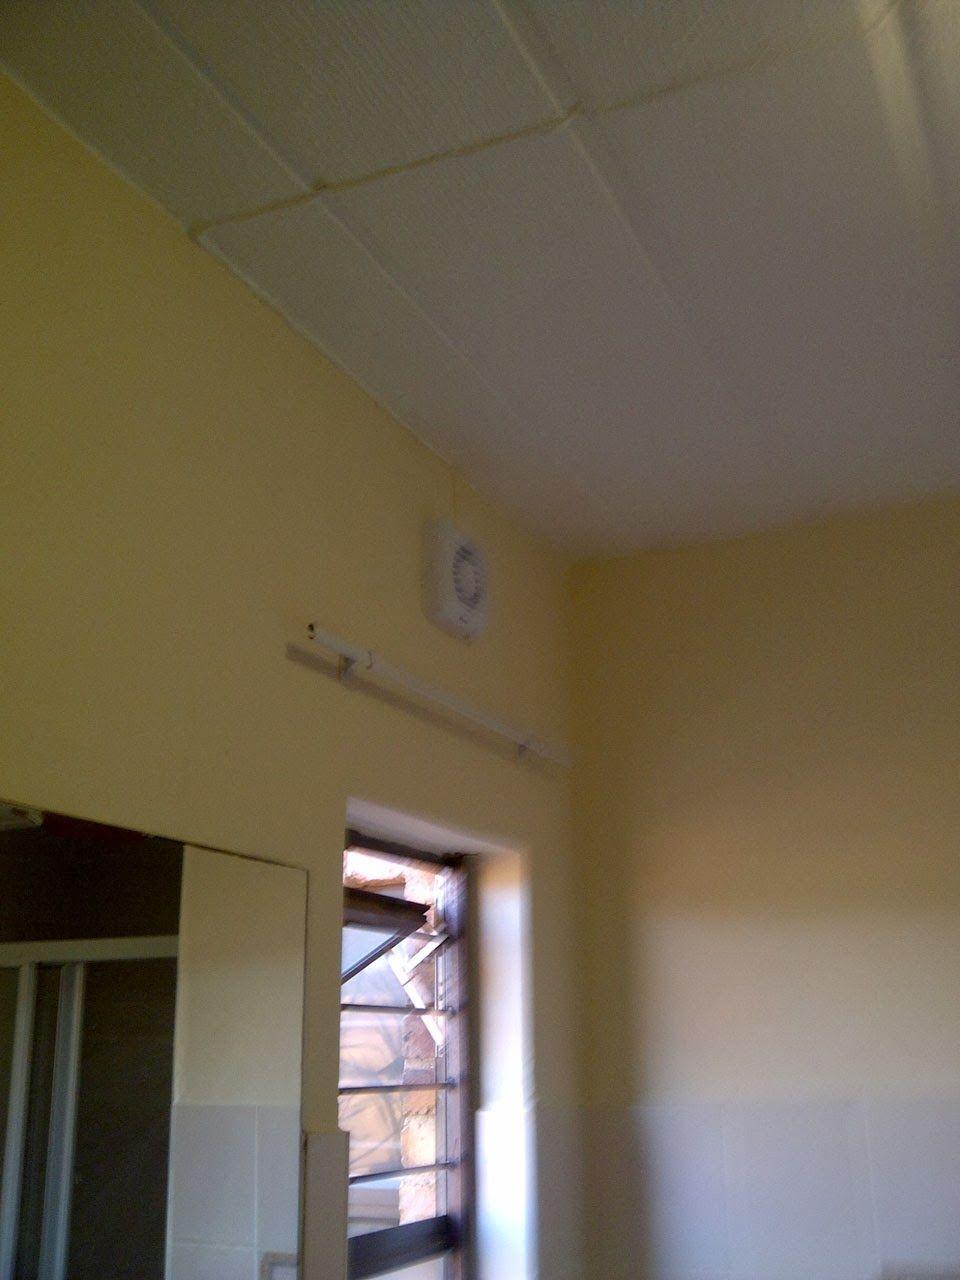 Mould Bathroom Mould Mildew Fungi Spores Bathroom Ceiling Damp - Paint for bathroom ceiling mold